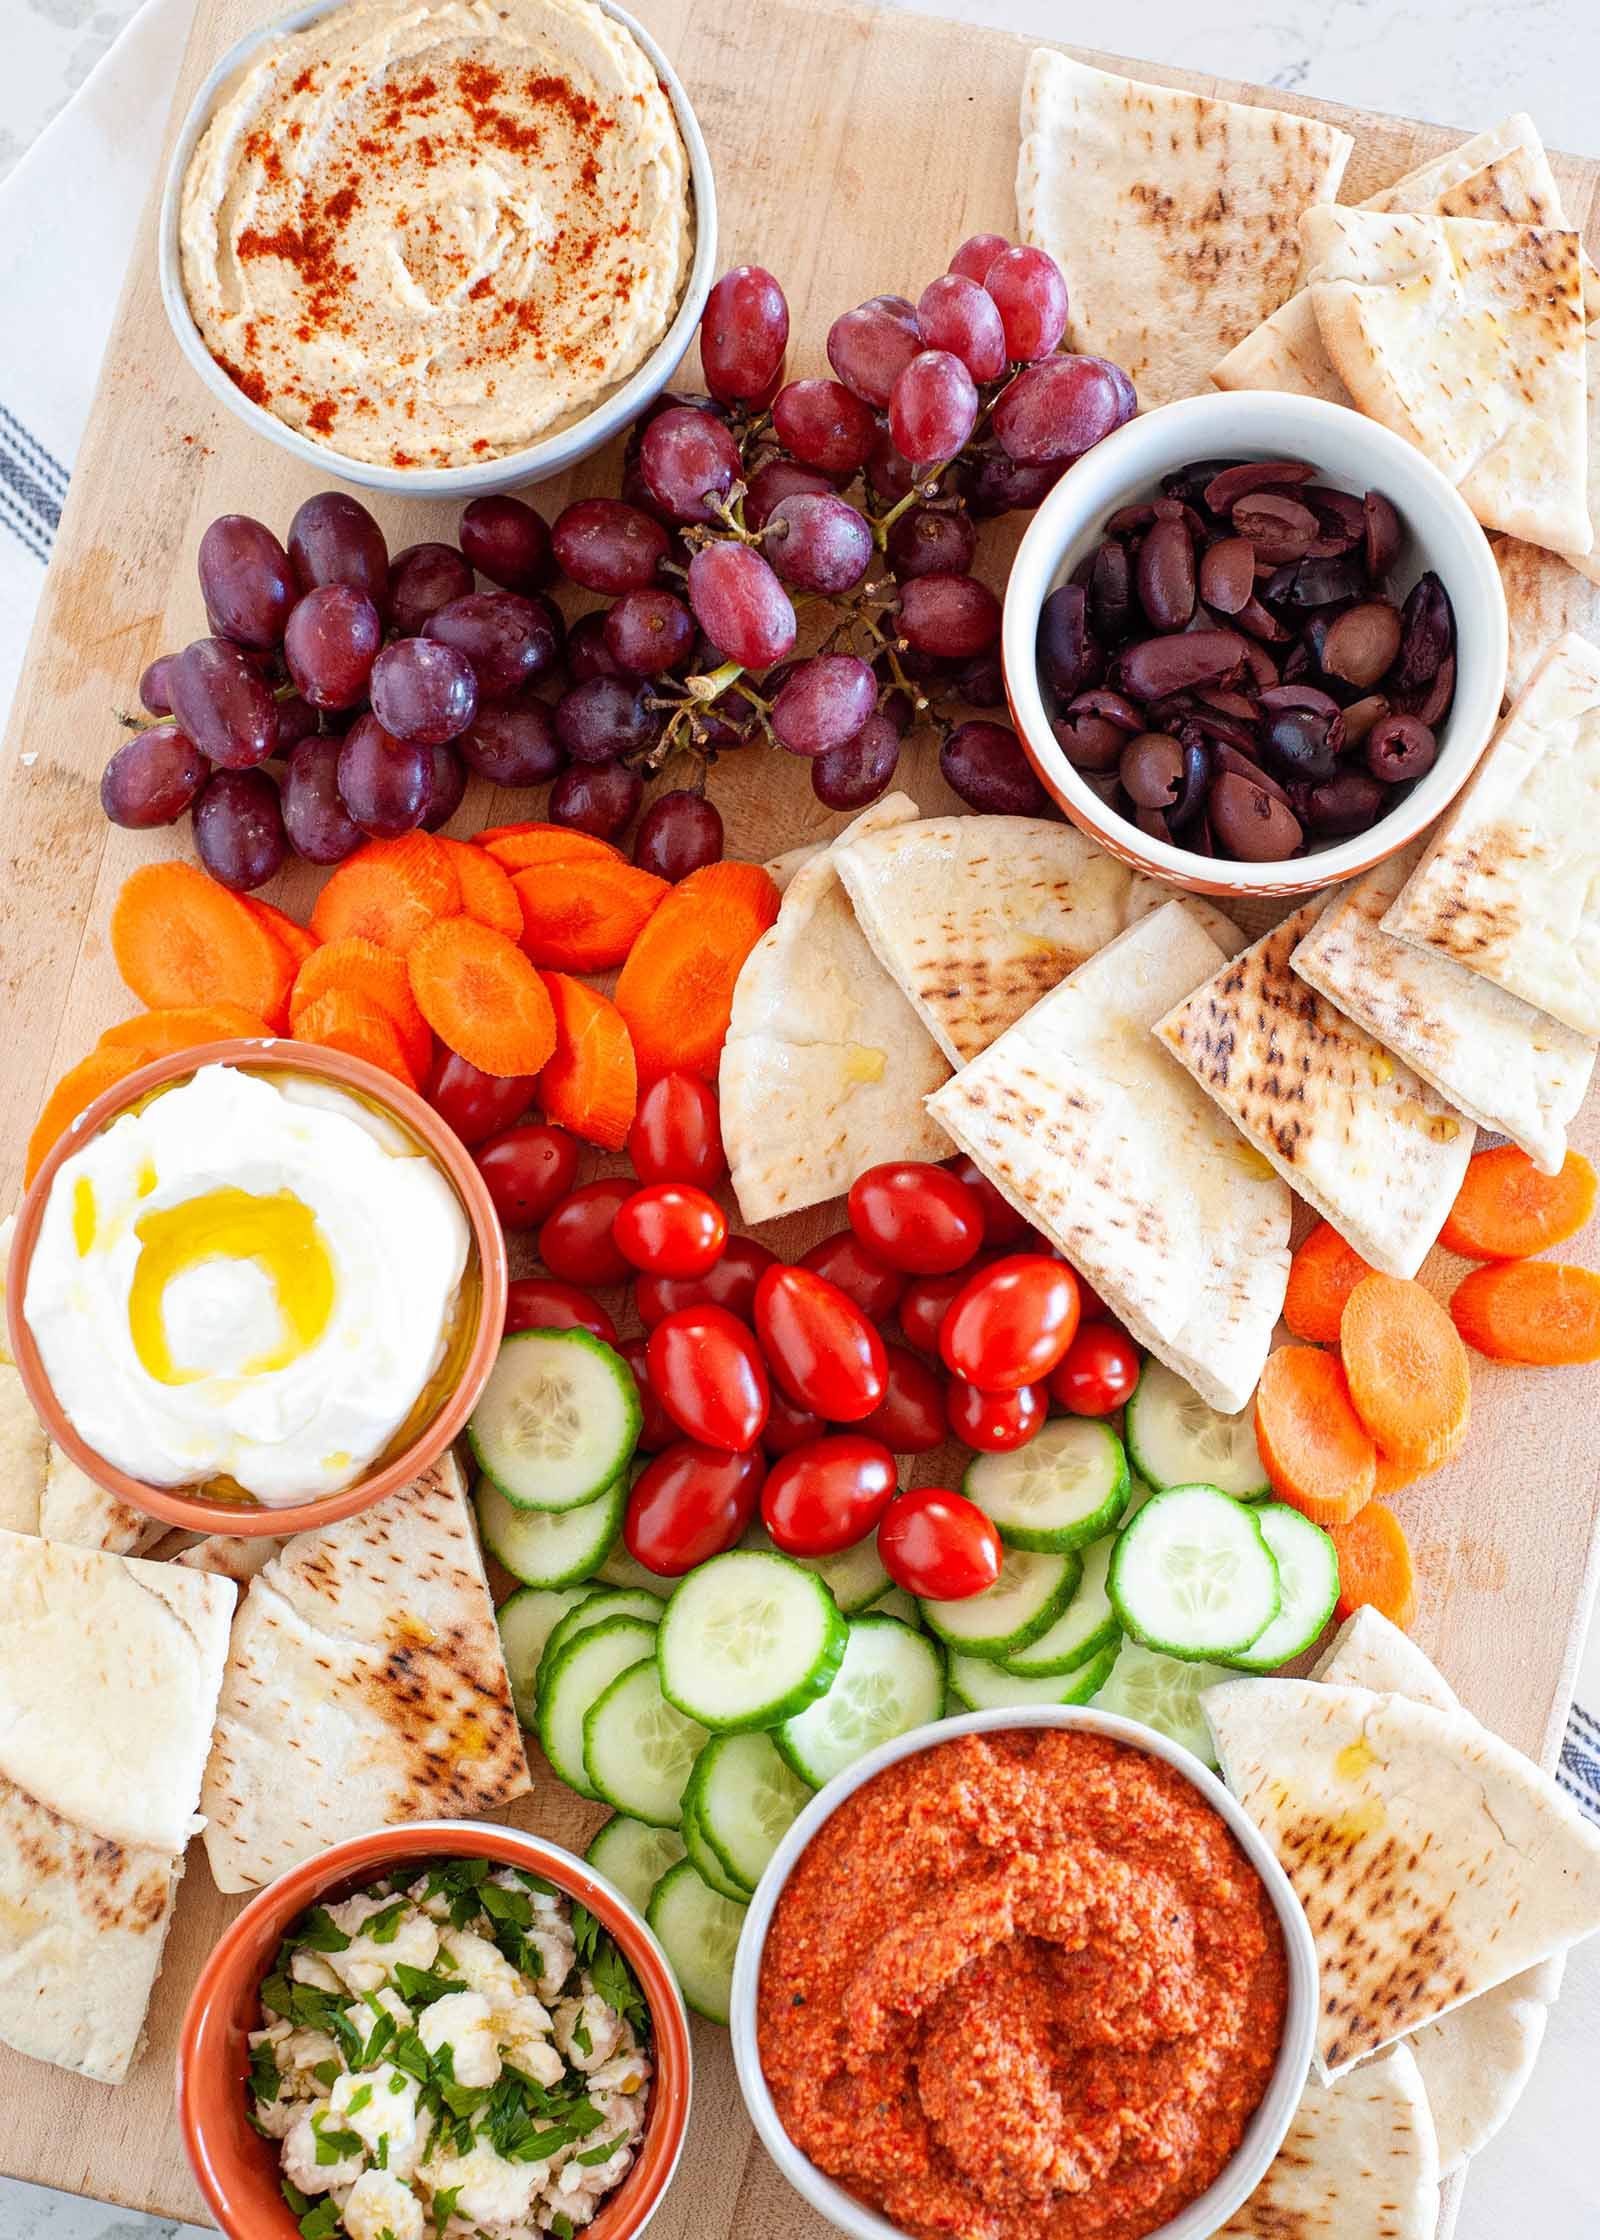 Mediterranean mezze platter with olives grapes vegetables pita